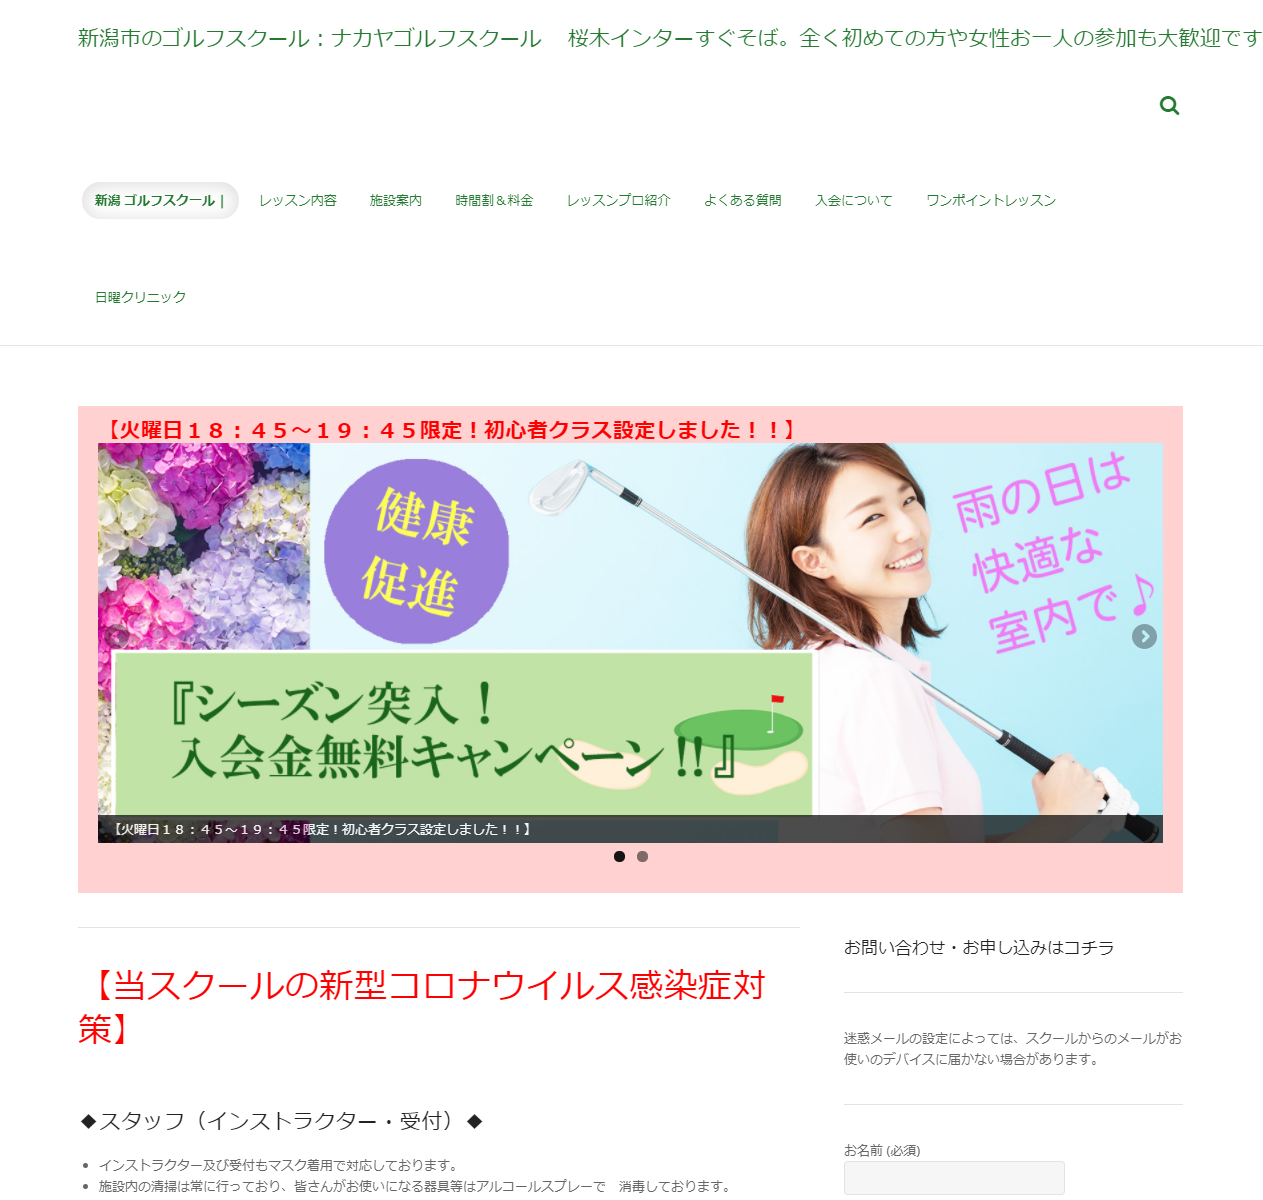 "<span class=""title"">ナカヤゴルフスクールの口コミや評判</span>"